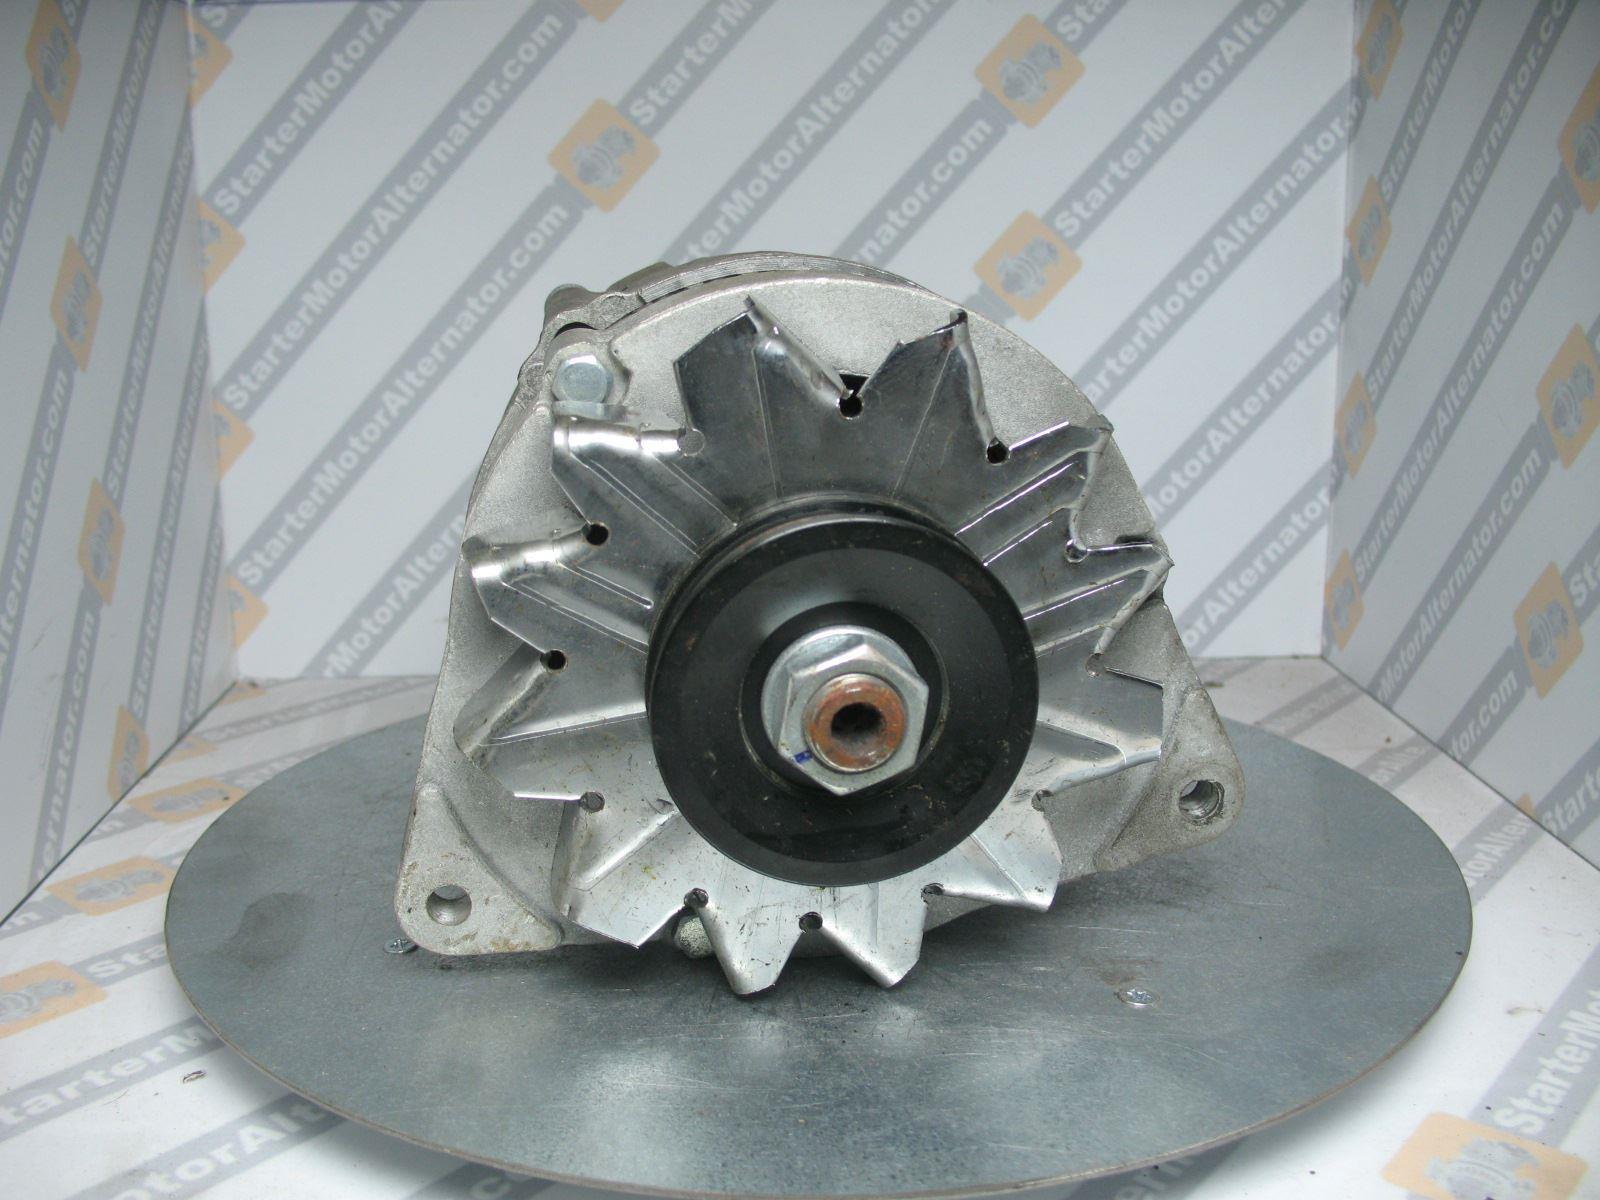 XIA3176 Alternator For BLMC Austin / Ford / Ford Truck/Tractor / JCB / LDV / Lotus / Massey Ferguson / MG / Morgan / Rover / Talbot / TVR